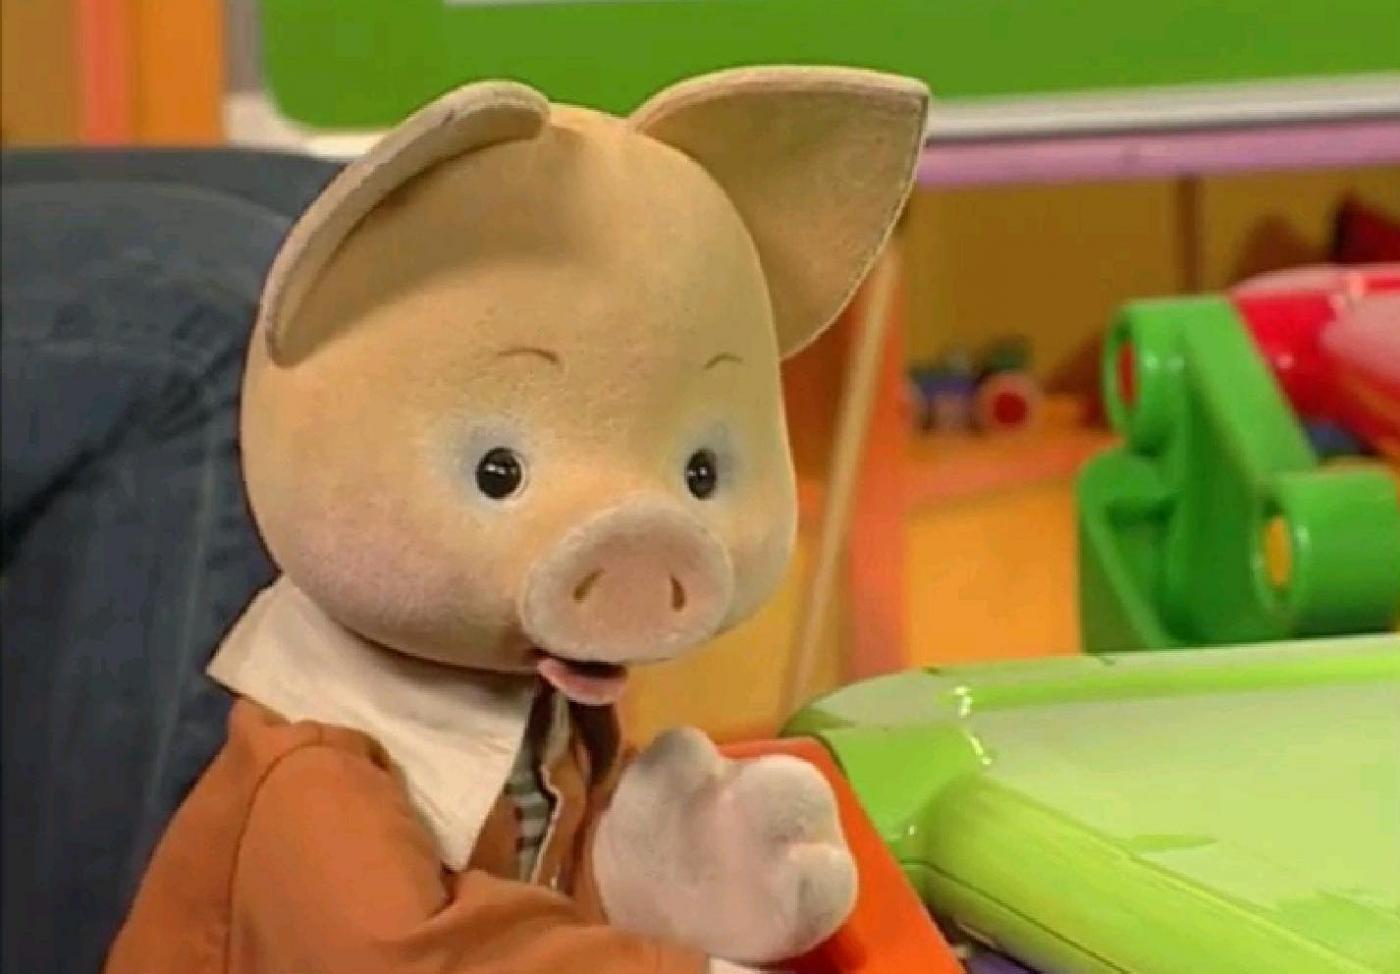 Khriusha the Pig